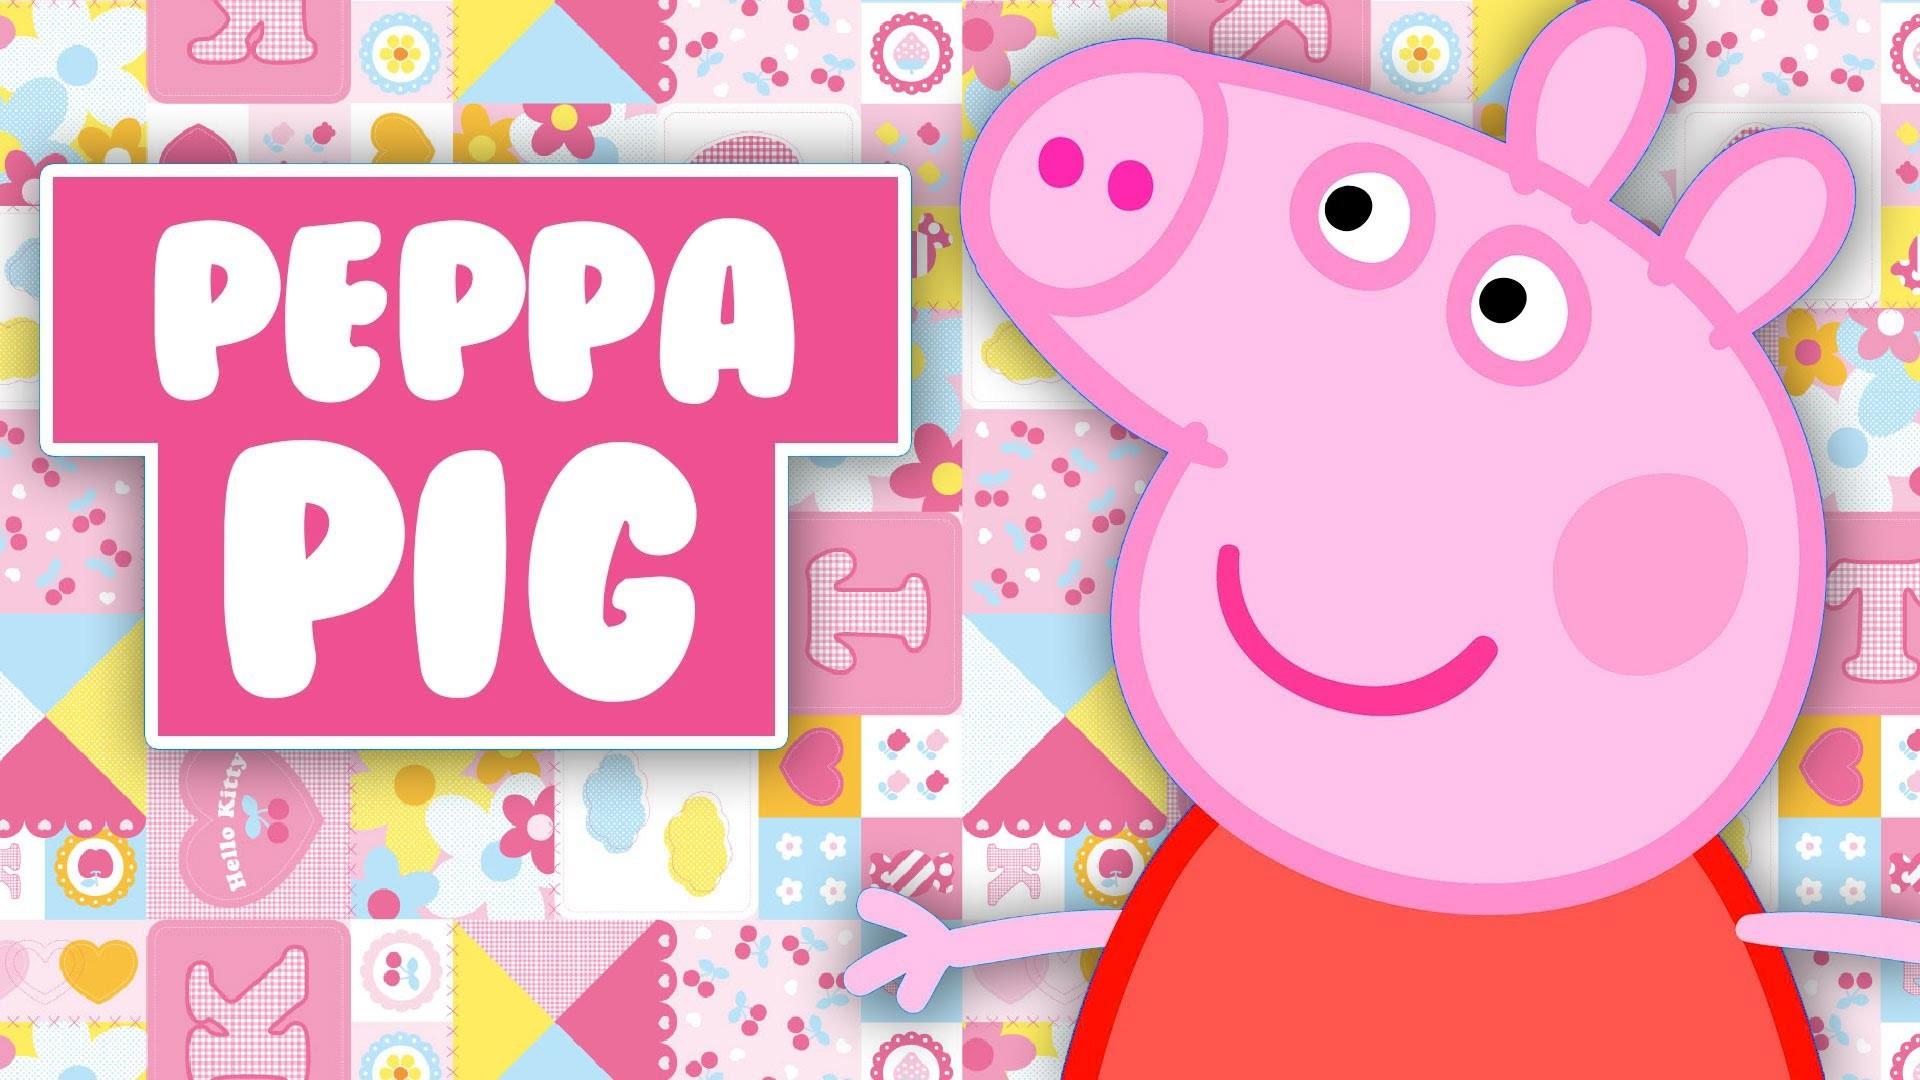 Peppa Pig Nose Doctor Full Episode Game